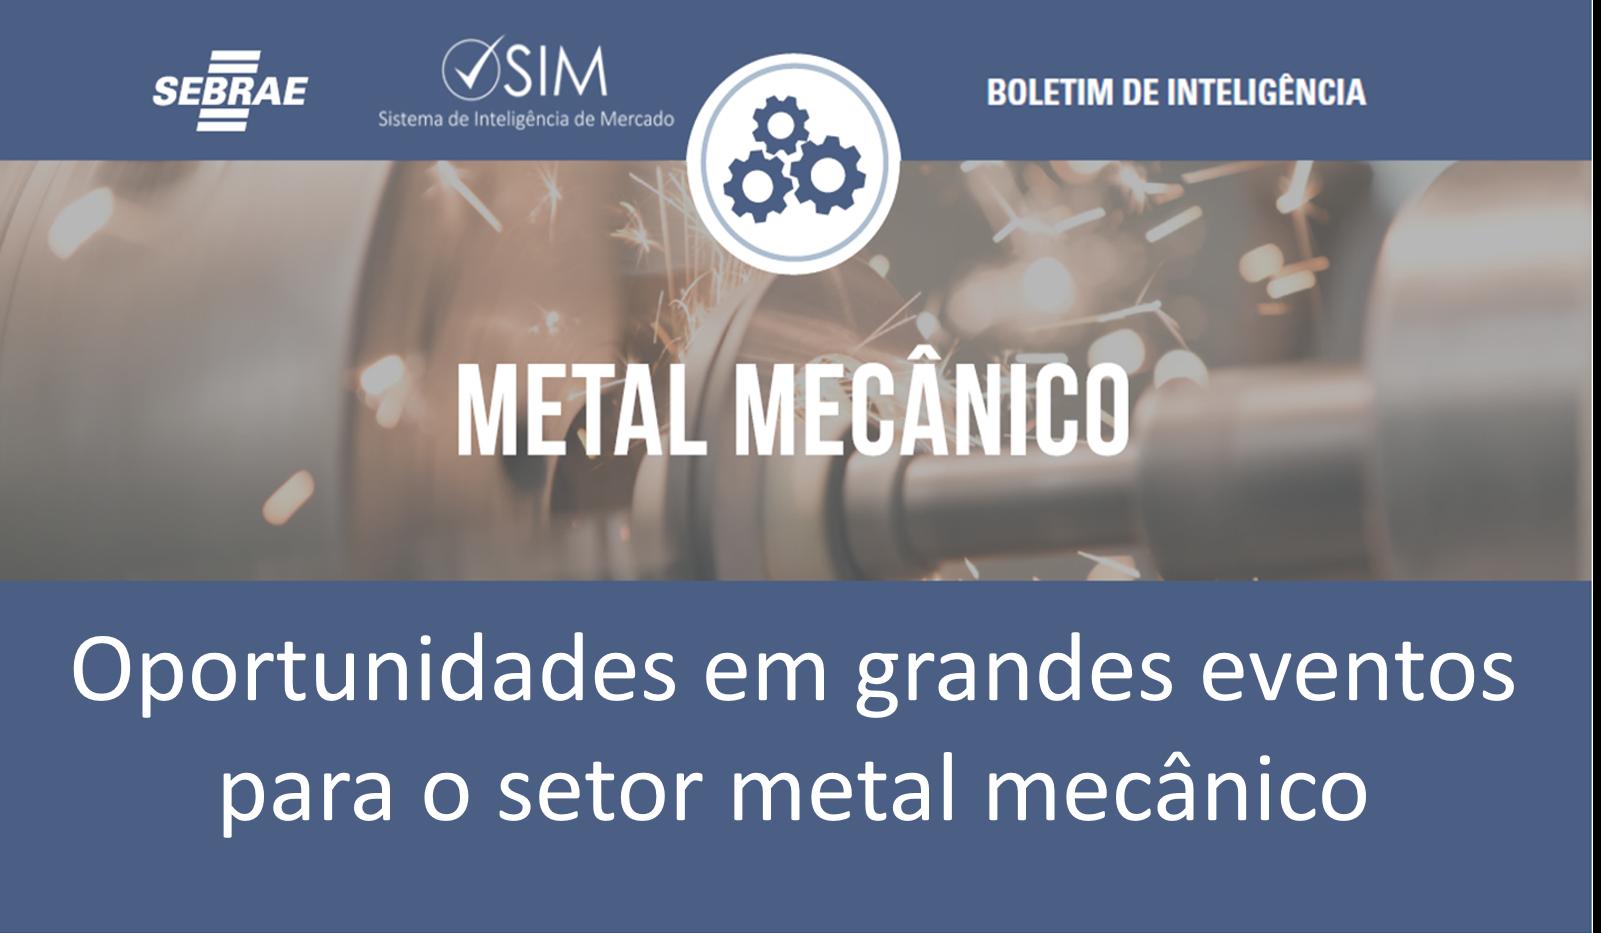 boletim metal mecanico